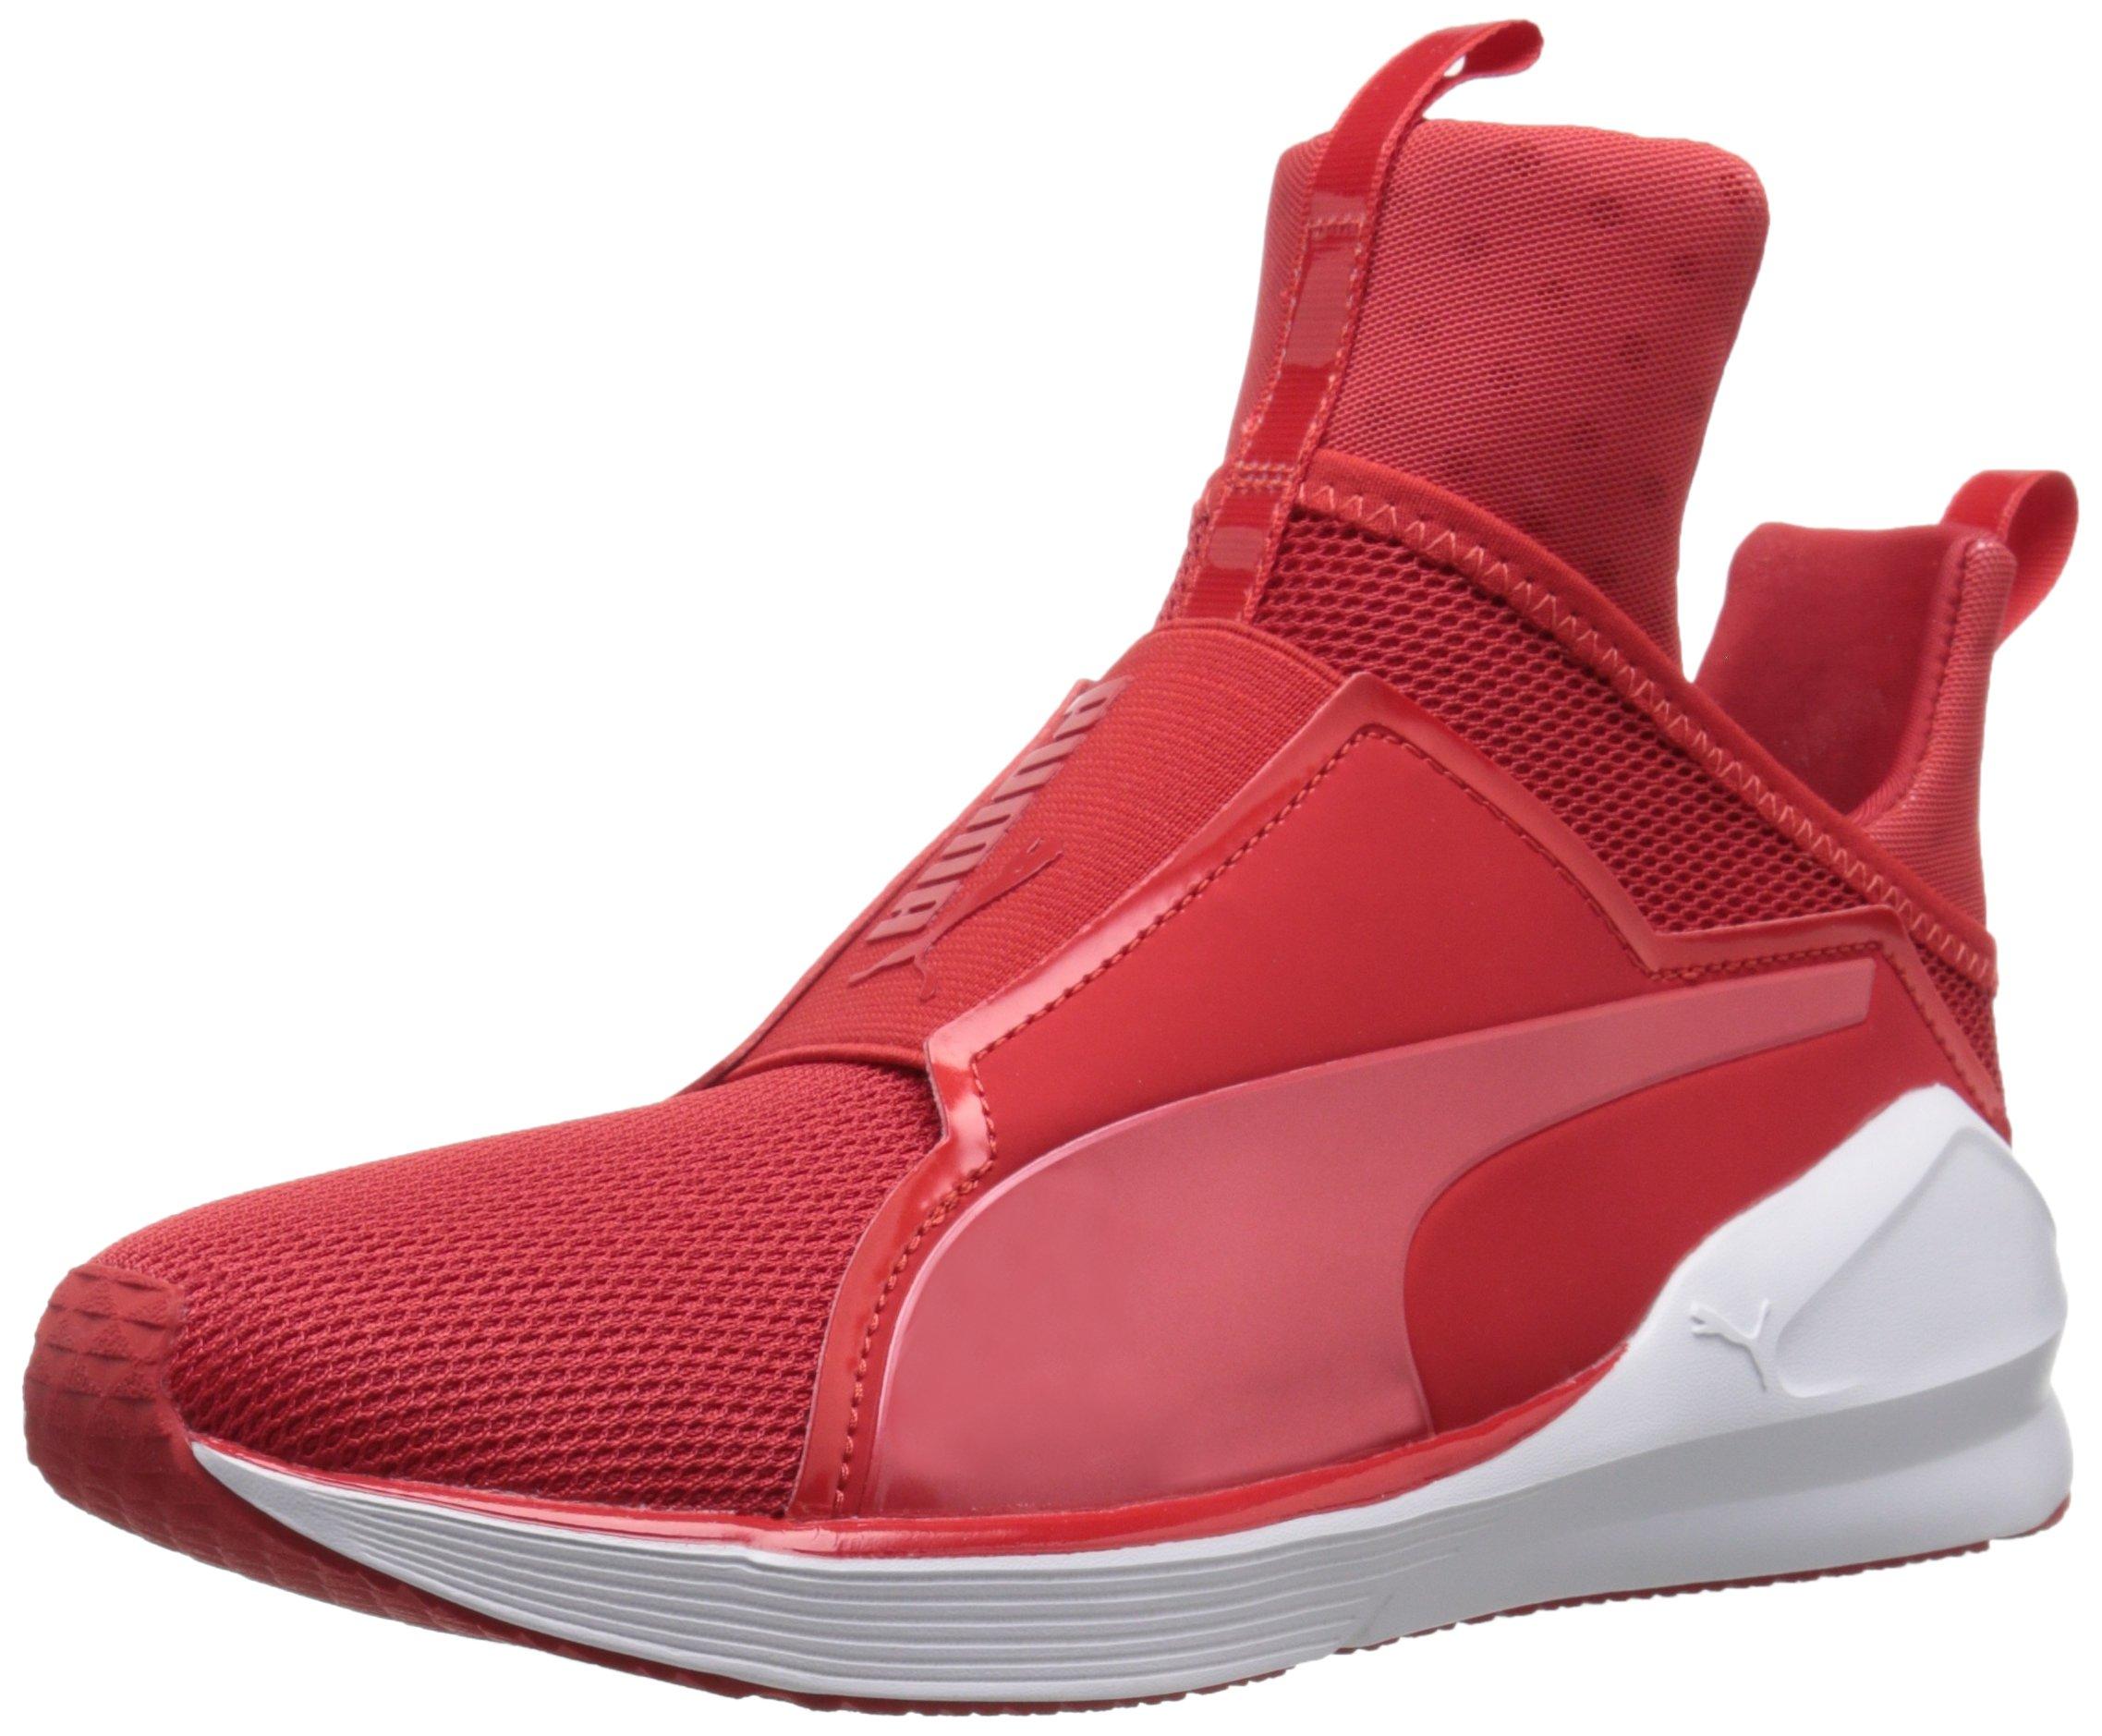 PUMA Women's Fierce Core Cross-Trainer Shoe, High Risk Red White, 7 M US